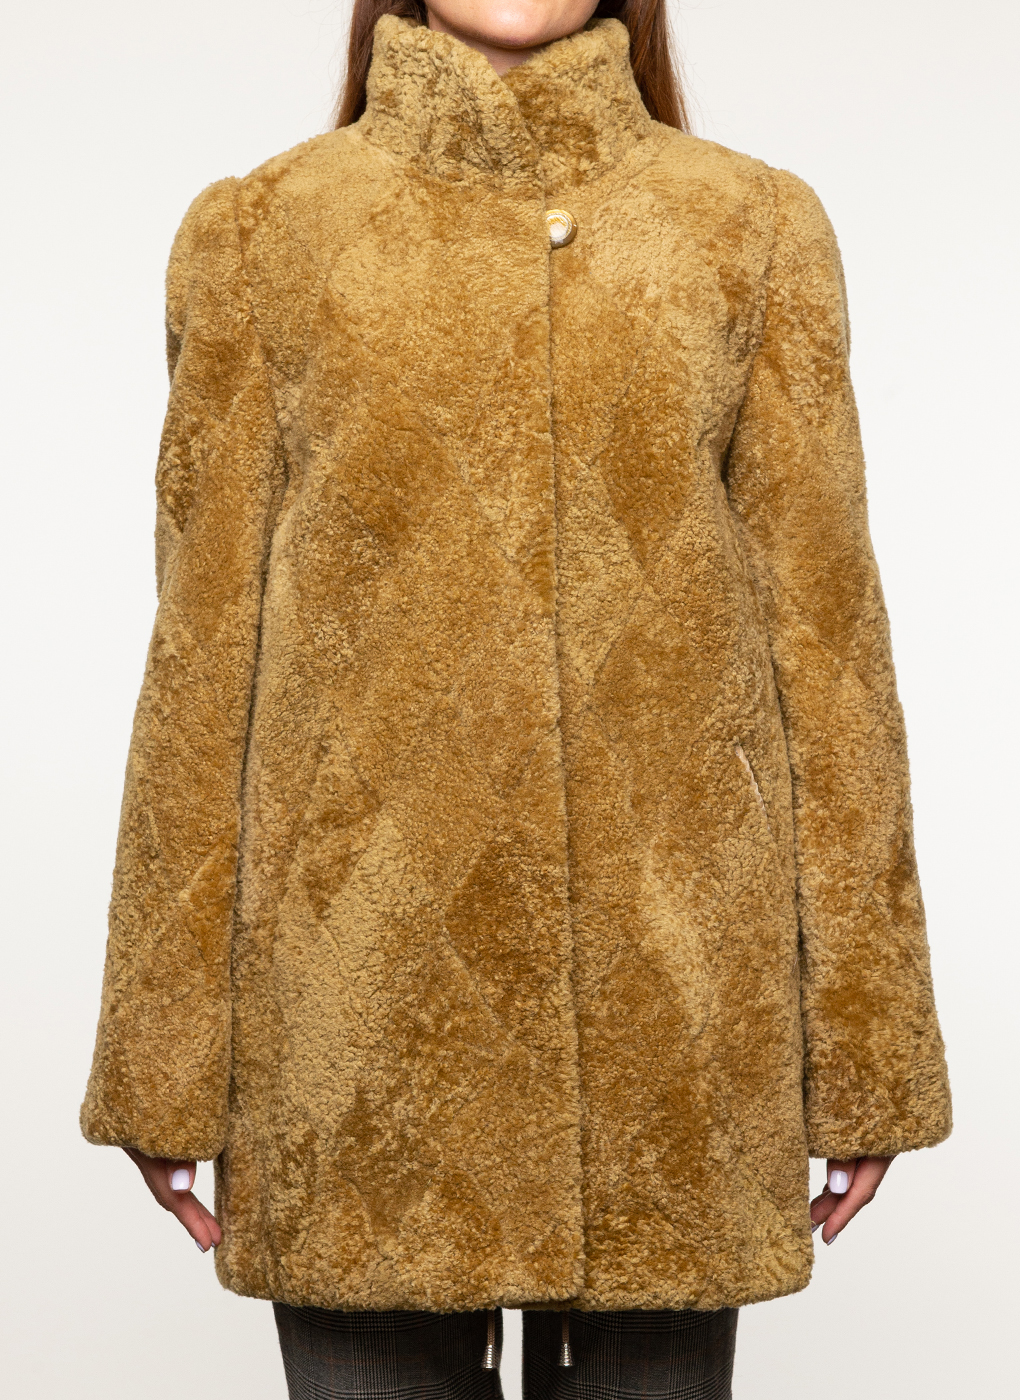 Куртка из овчины прямая 03, Anna Romanova furs фото